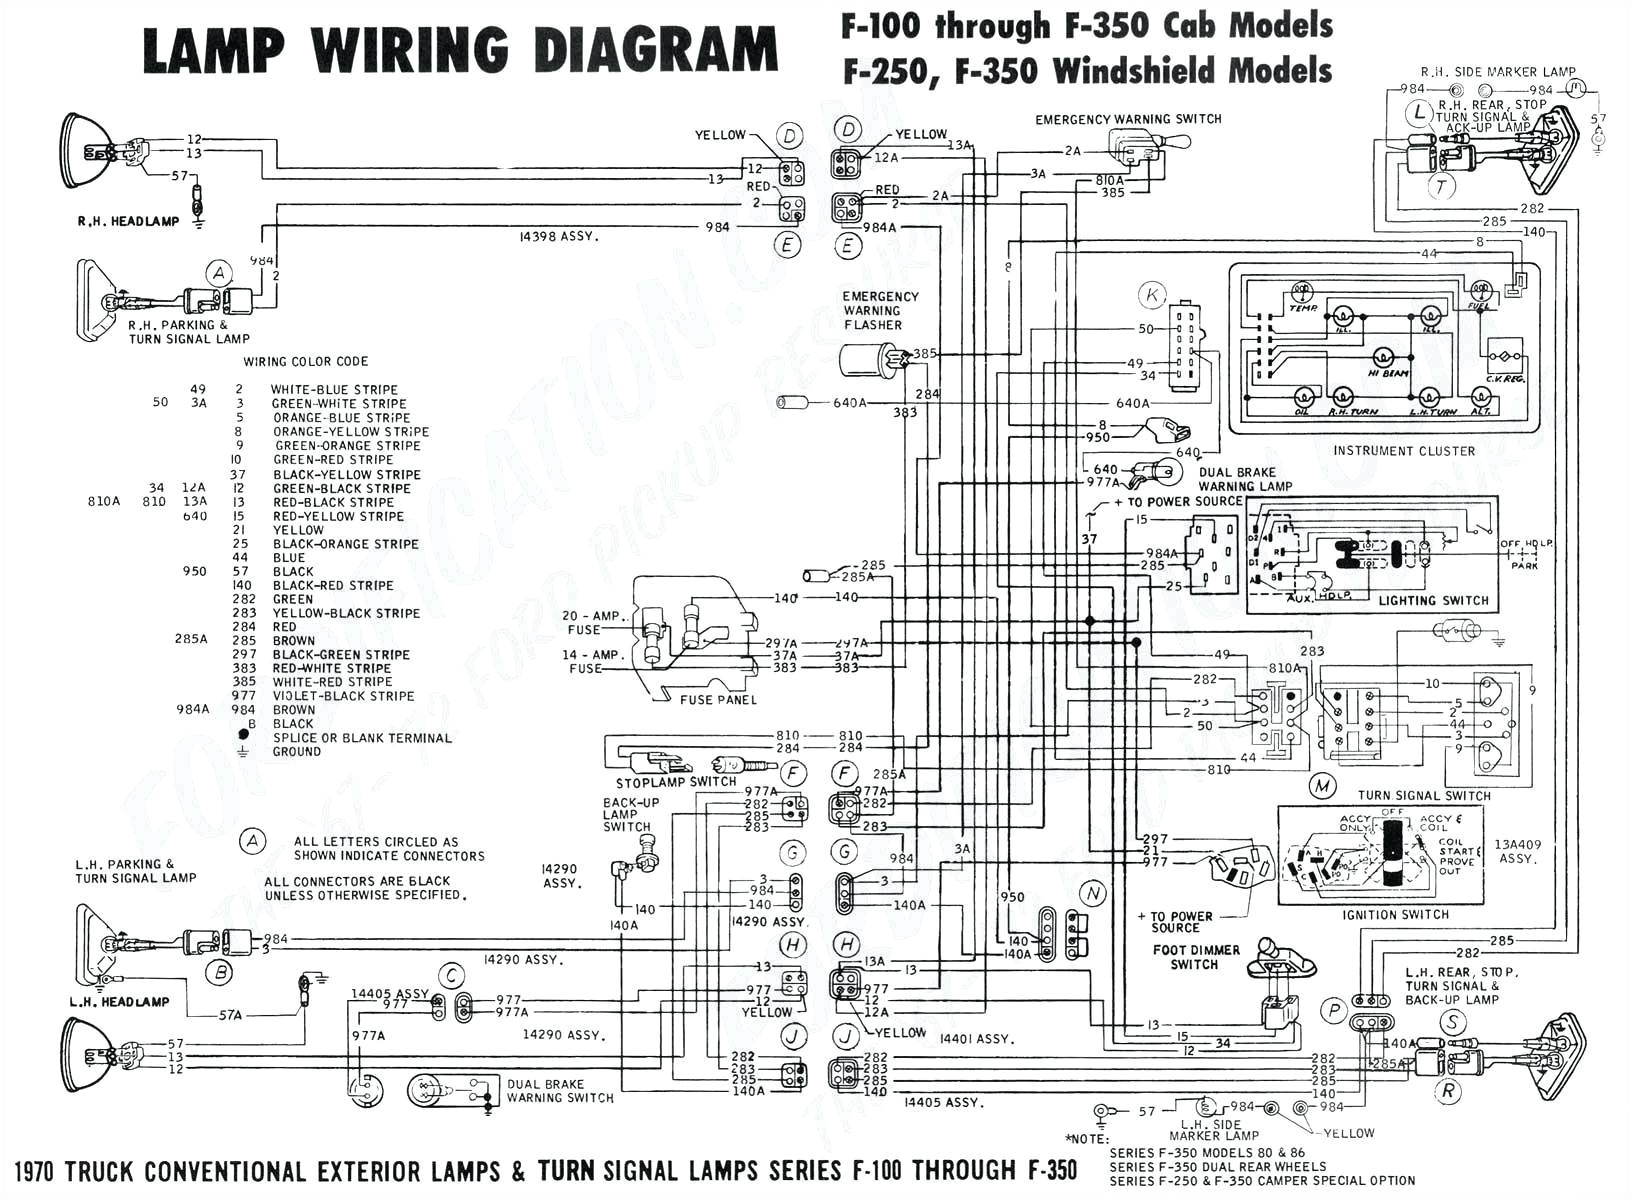 1999 ford Explorer Wiring Diagram Model Wiring Lg Diagram Arnuo93bha2 Wiring Diagram Used